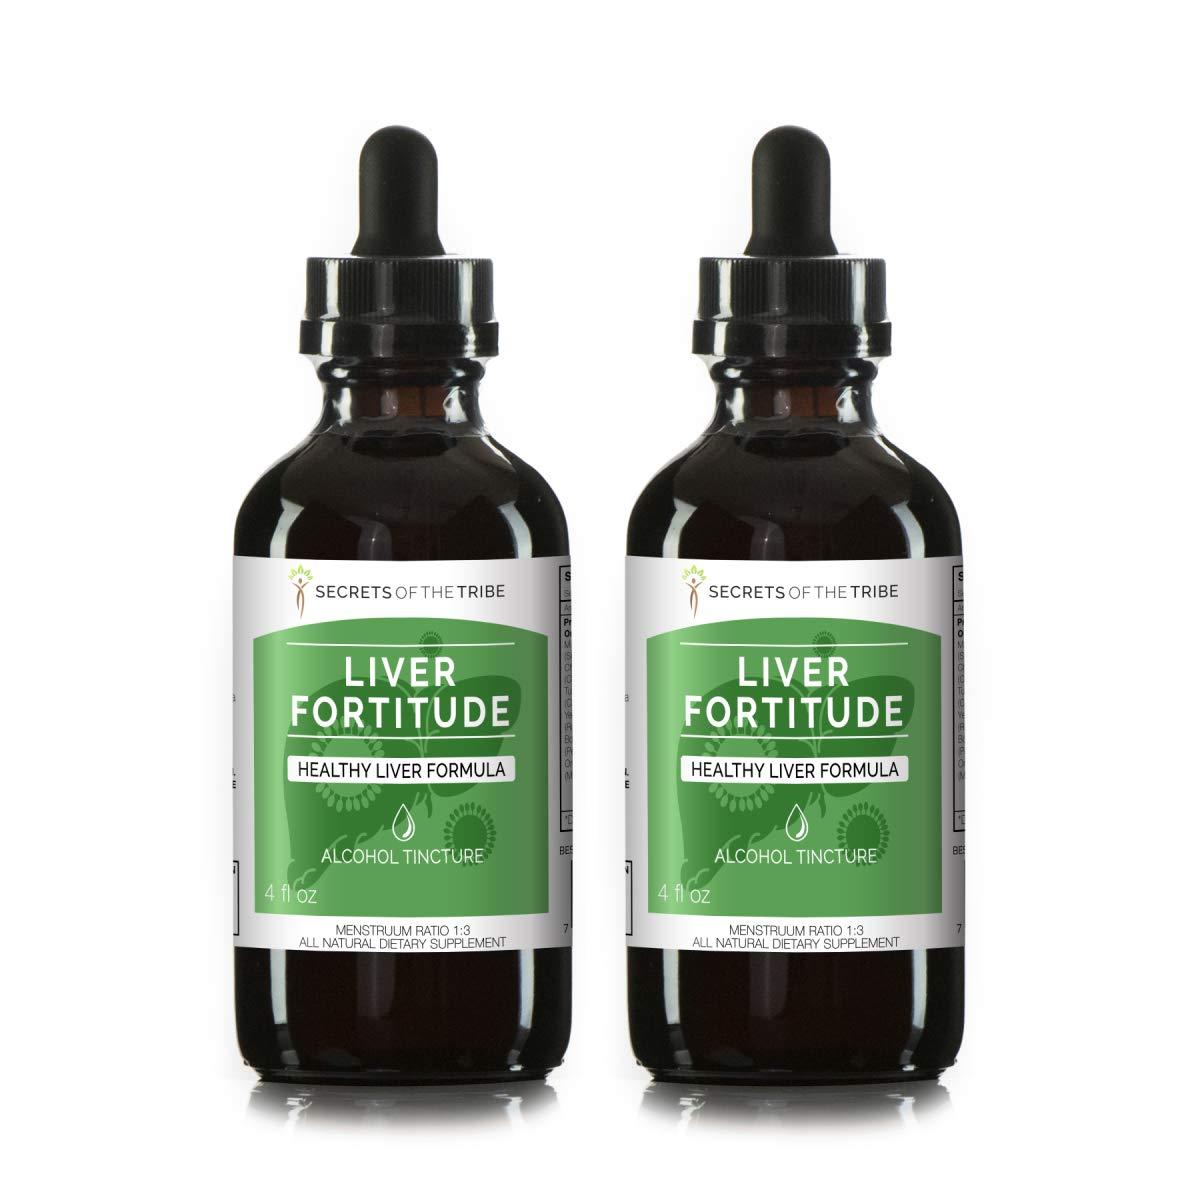 Liver Fortitude Alcohol Extract, Tincture, Milk Thistle, Chicory, Turmeric, Yellow Dock, Boldo, Oregon Grape. Healthy Liver Formula (2x4 FL OZ)